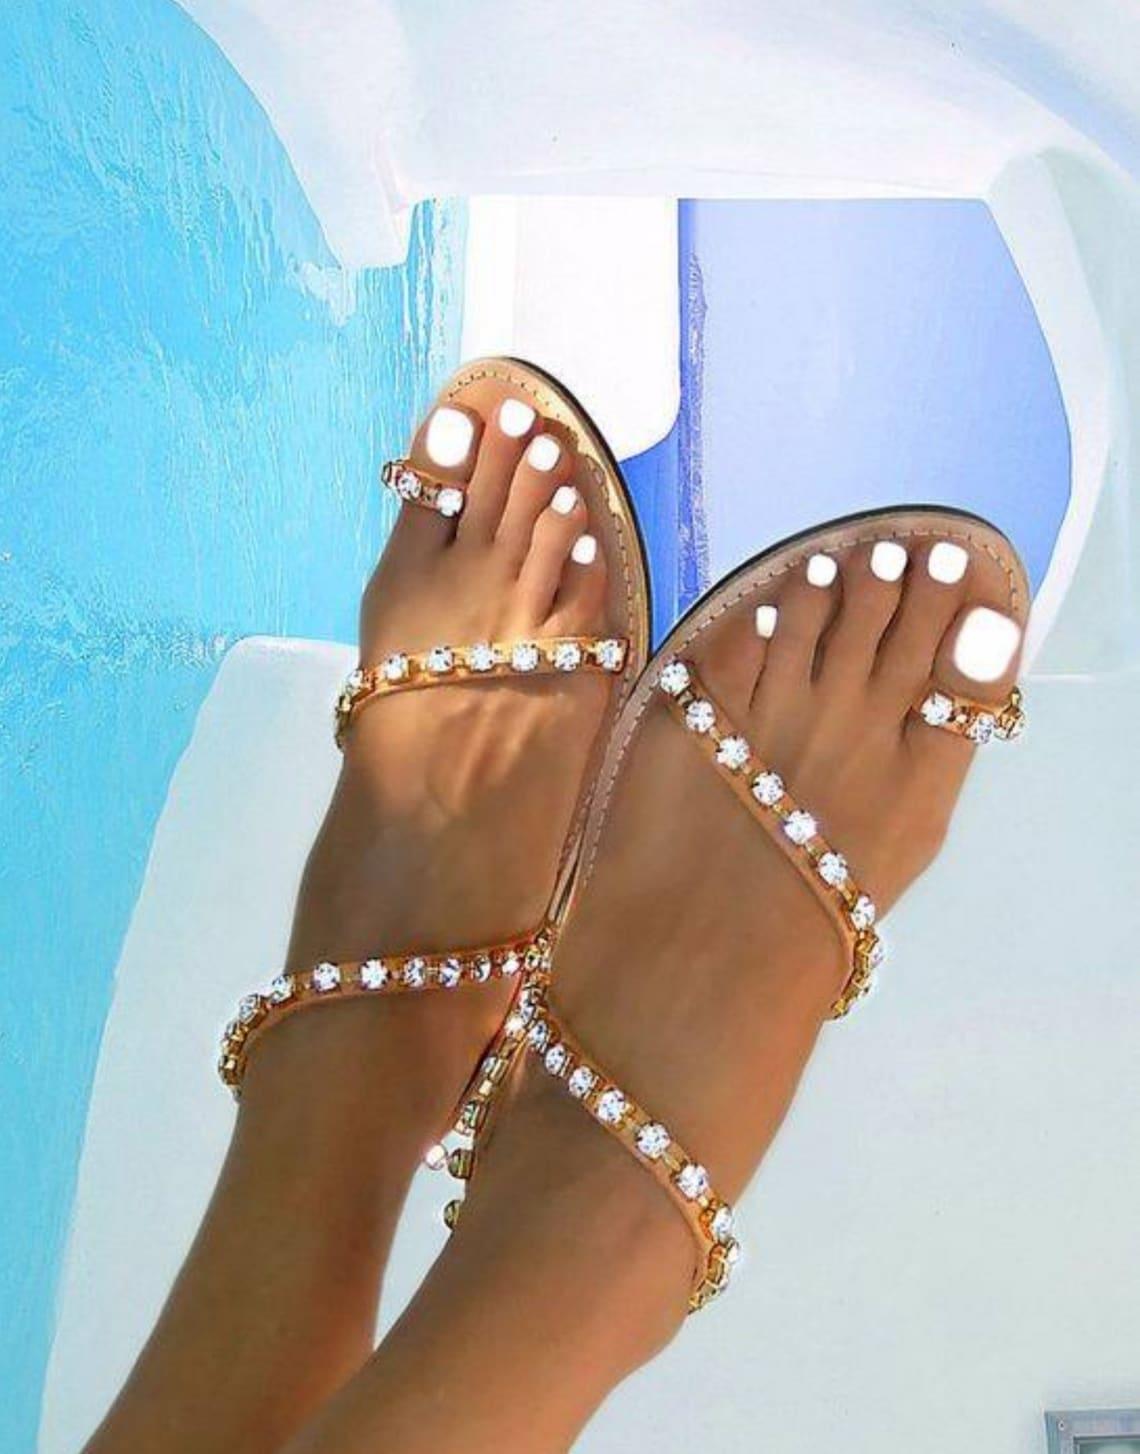 Greek sandals,sparkle, gladiator,bridal,crystals ,women sandals,wedding sandals,leather sandals,boho,ethnic,luxury sandals,strappy